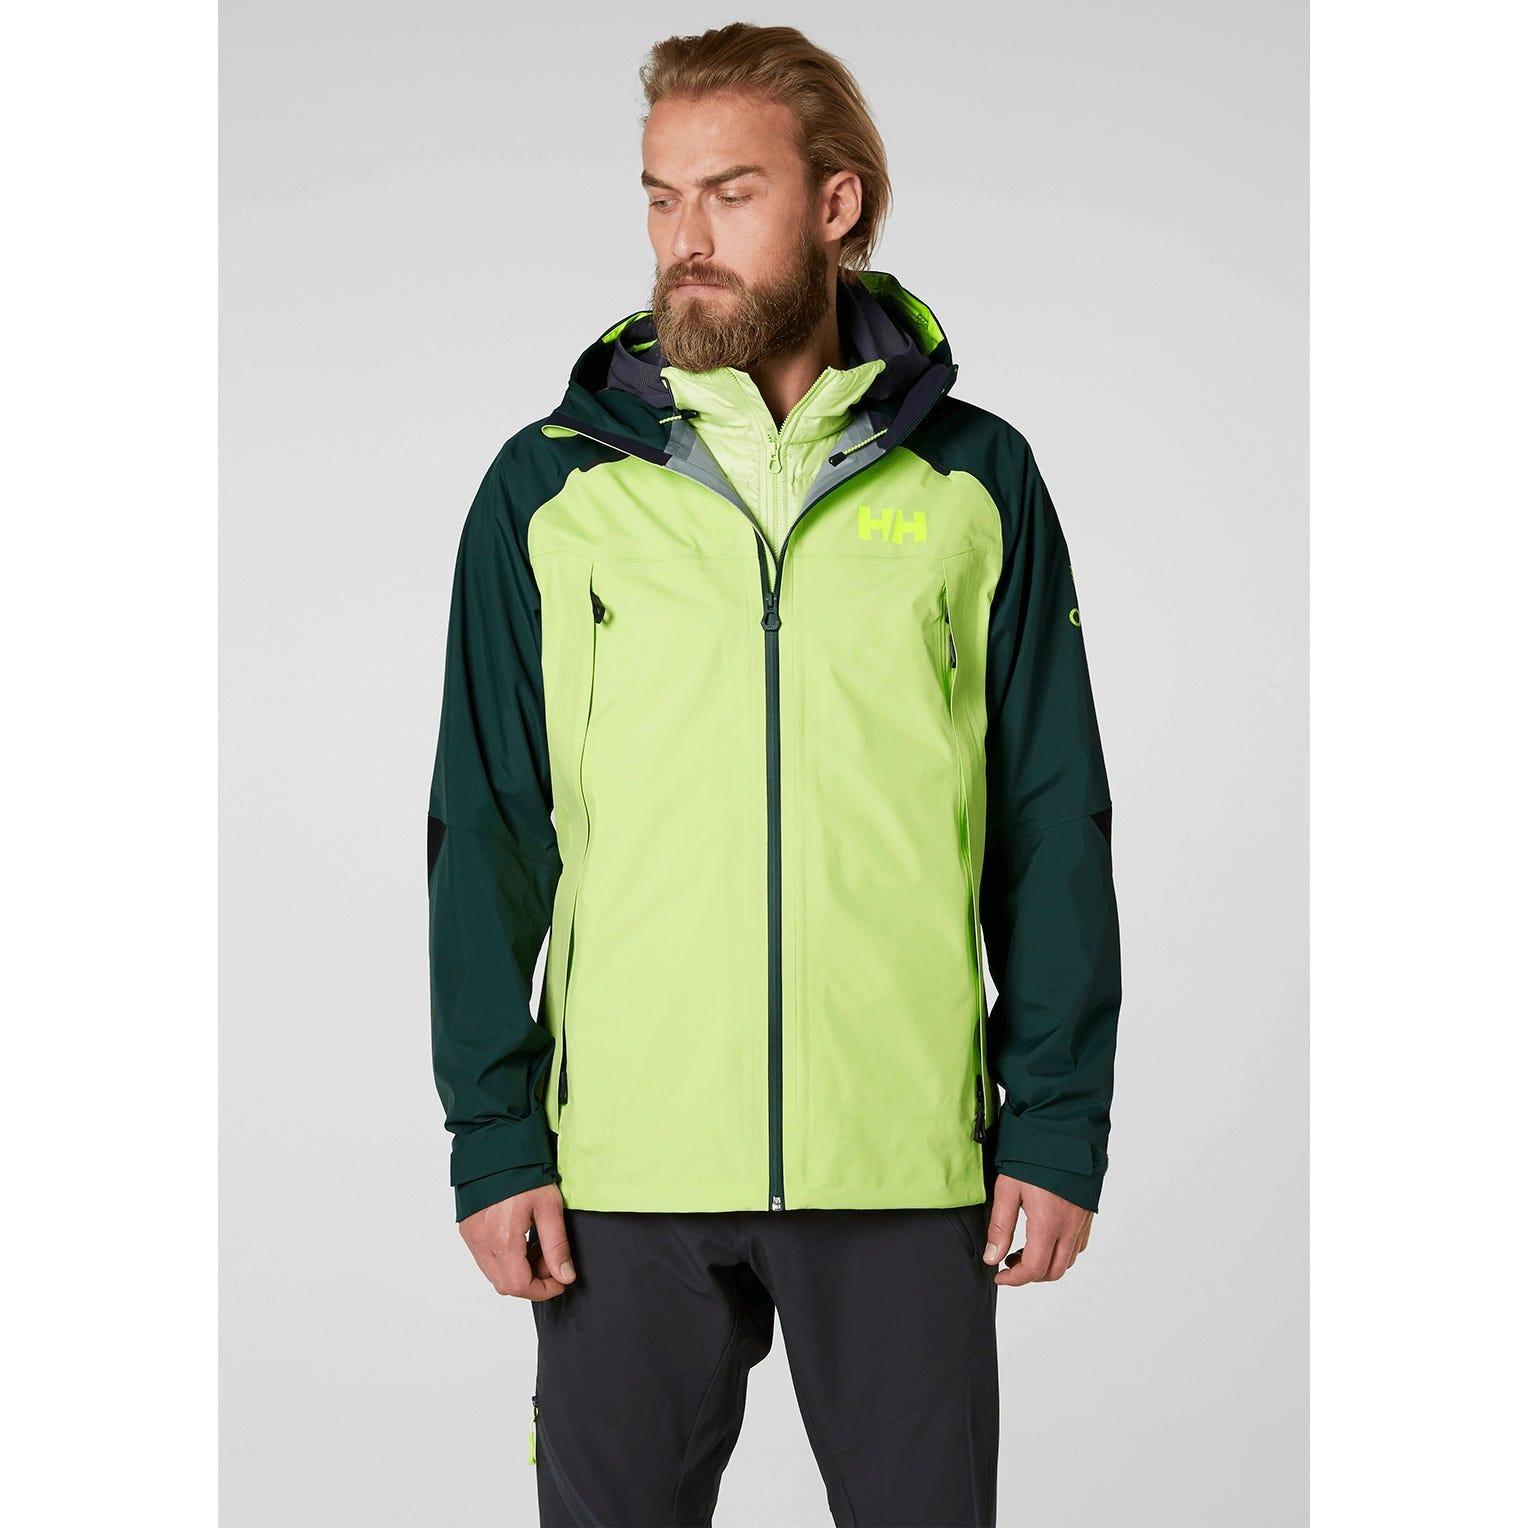 Helly Hansen Odin 9 Worlds Hiking Jacket Green for Men